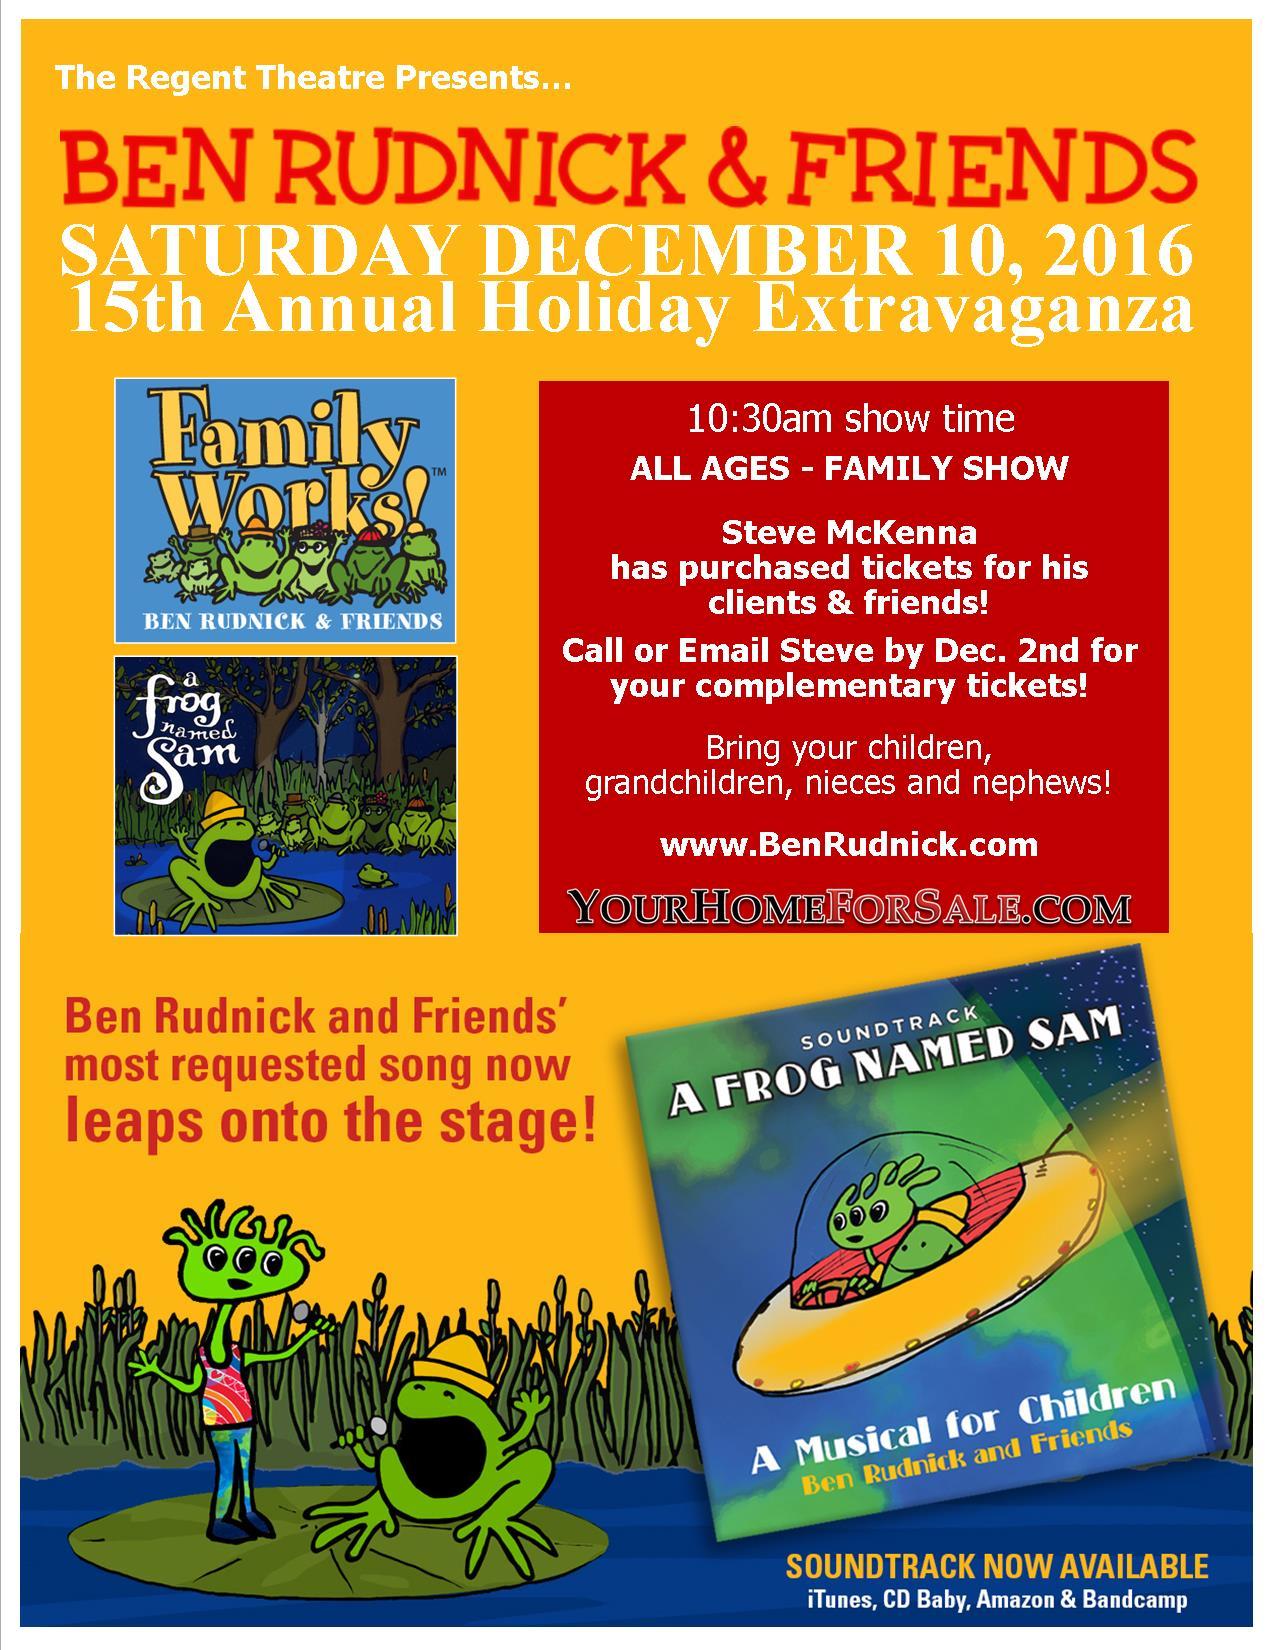 Ben Rudnick & Friends Holiday Concert